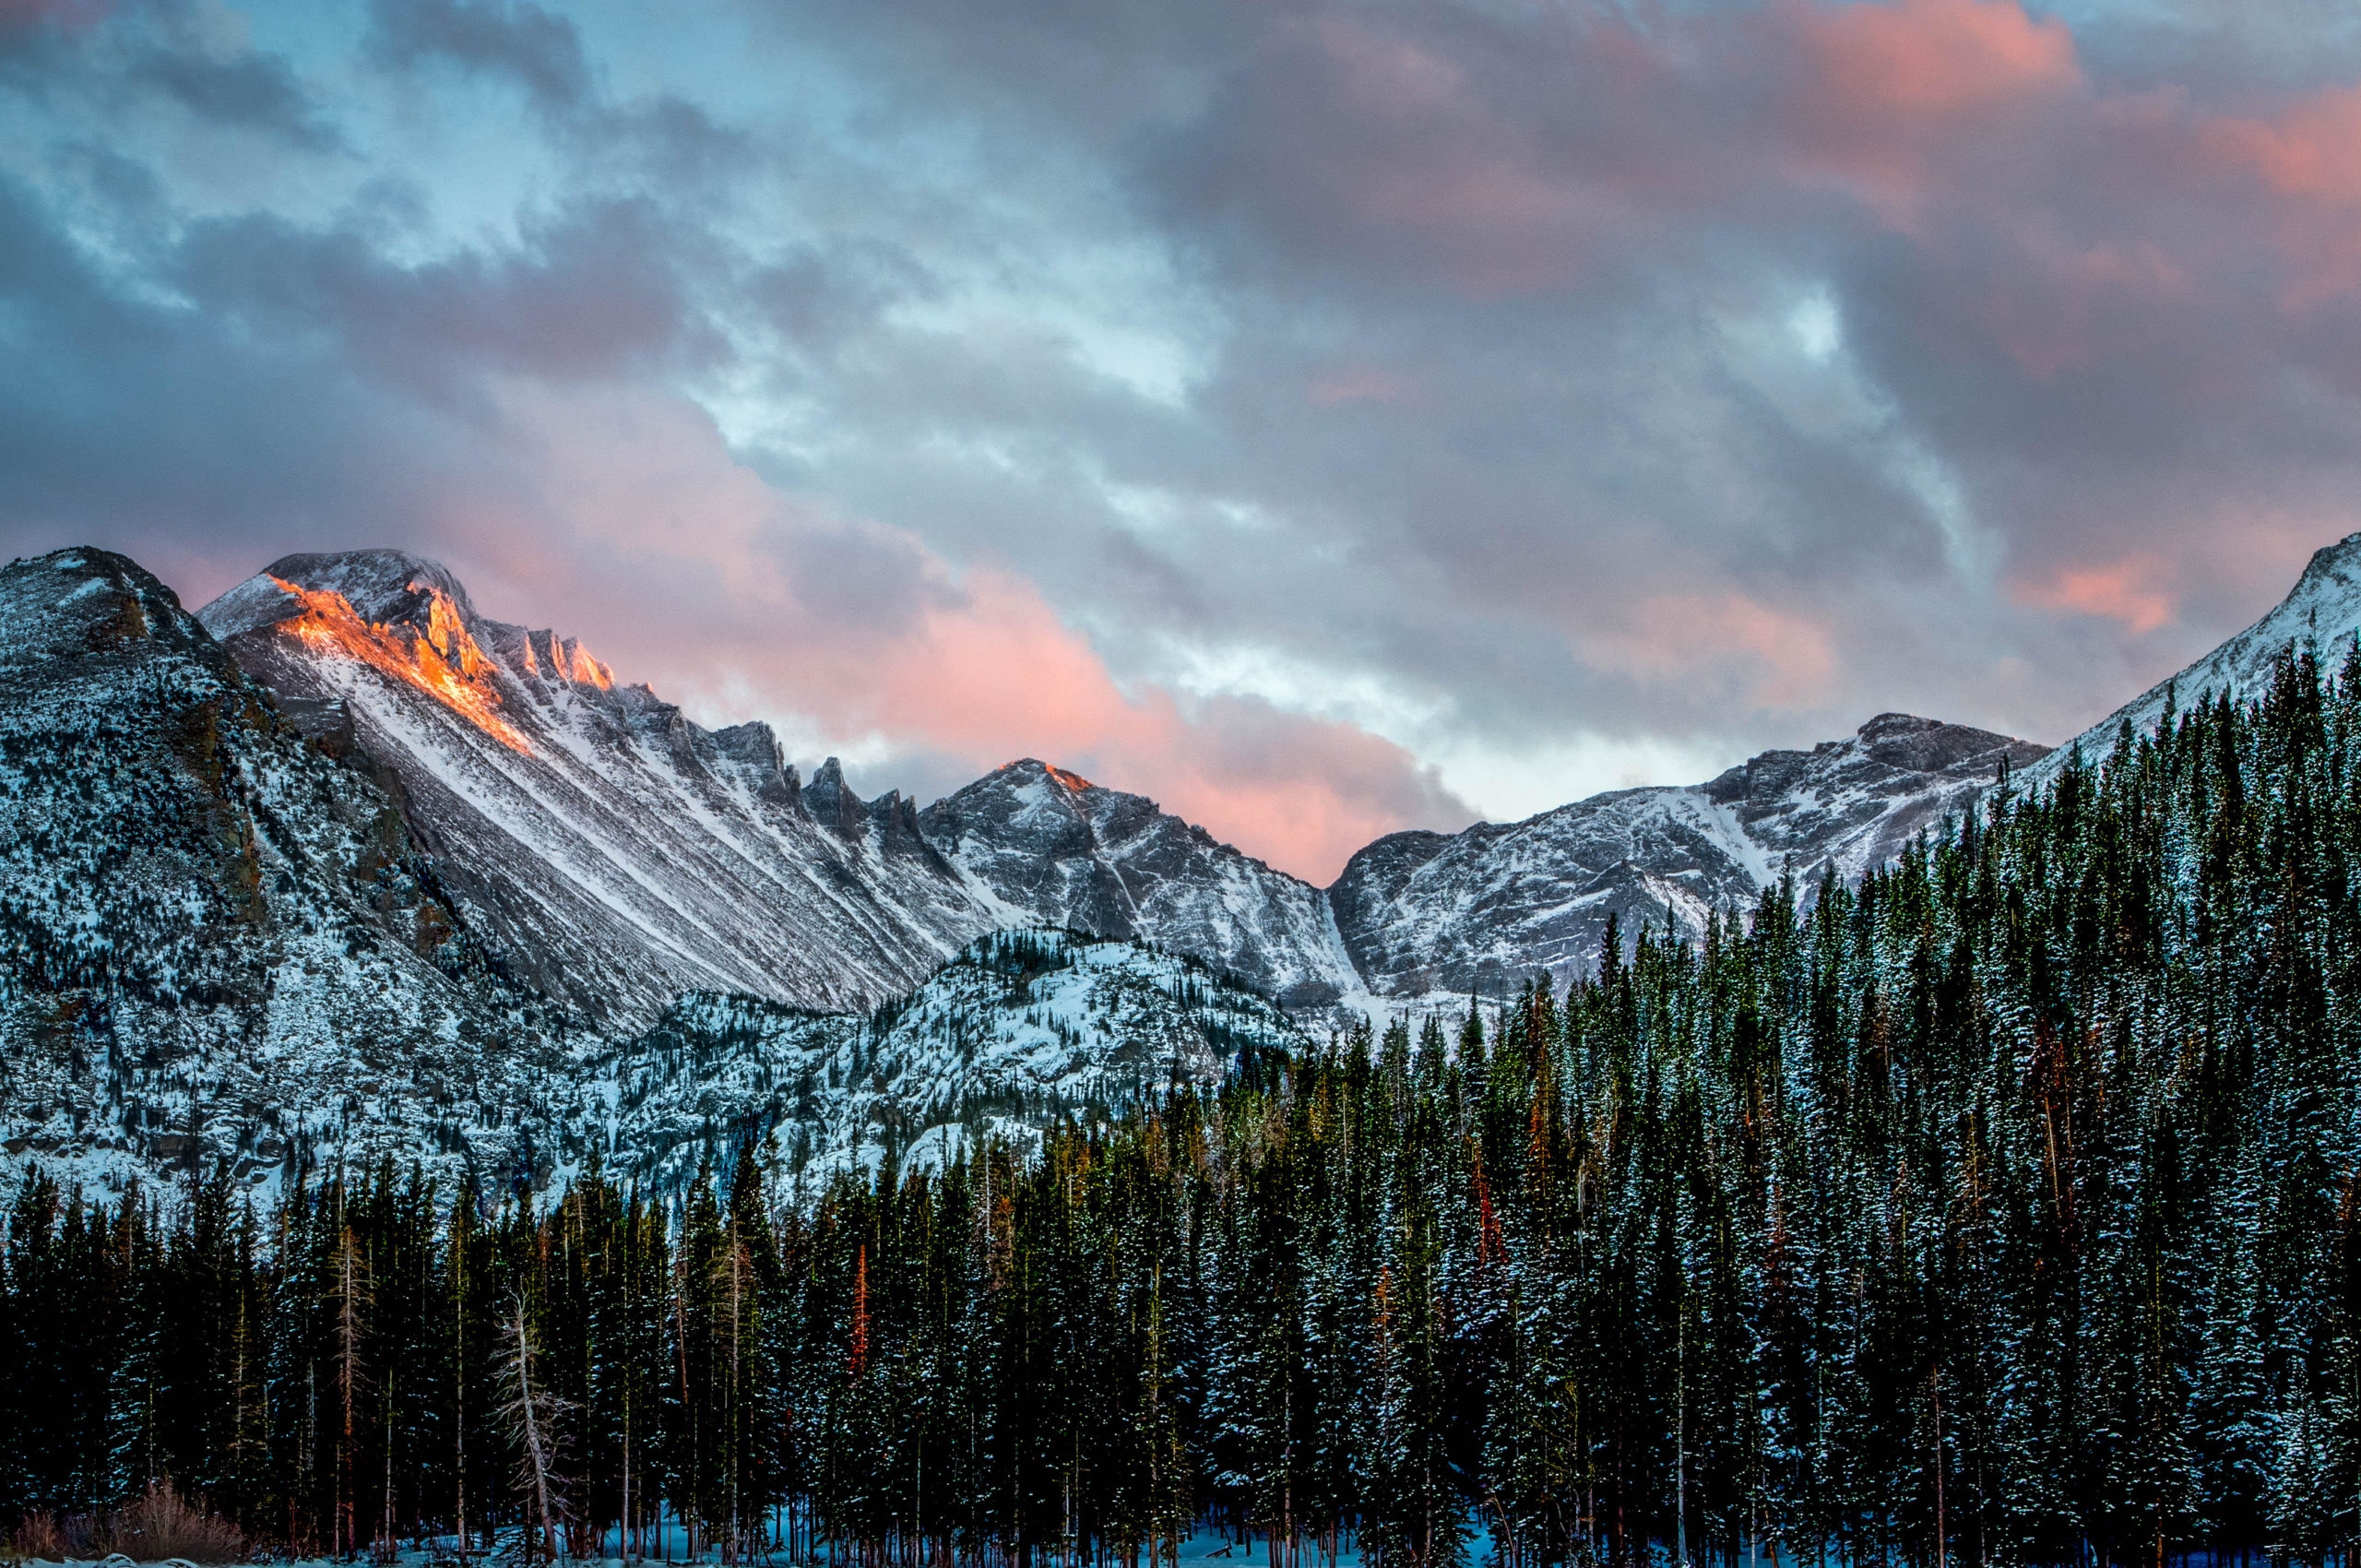 alpenglow sunset longs peak